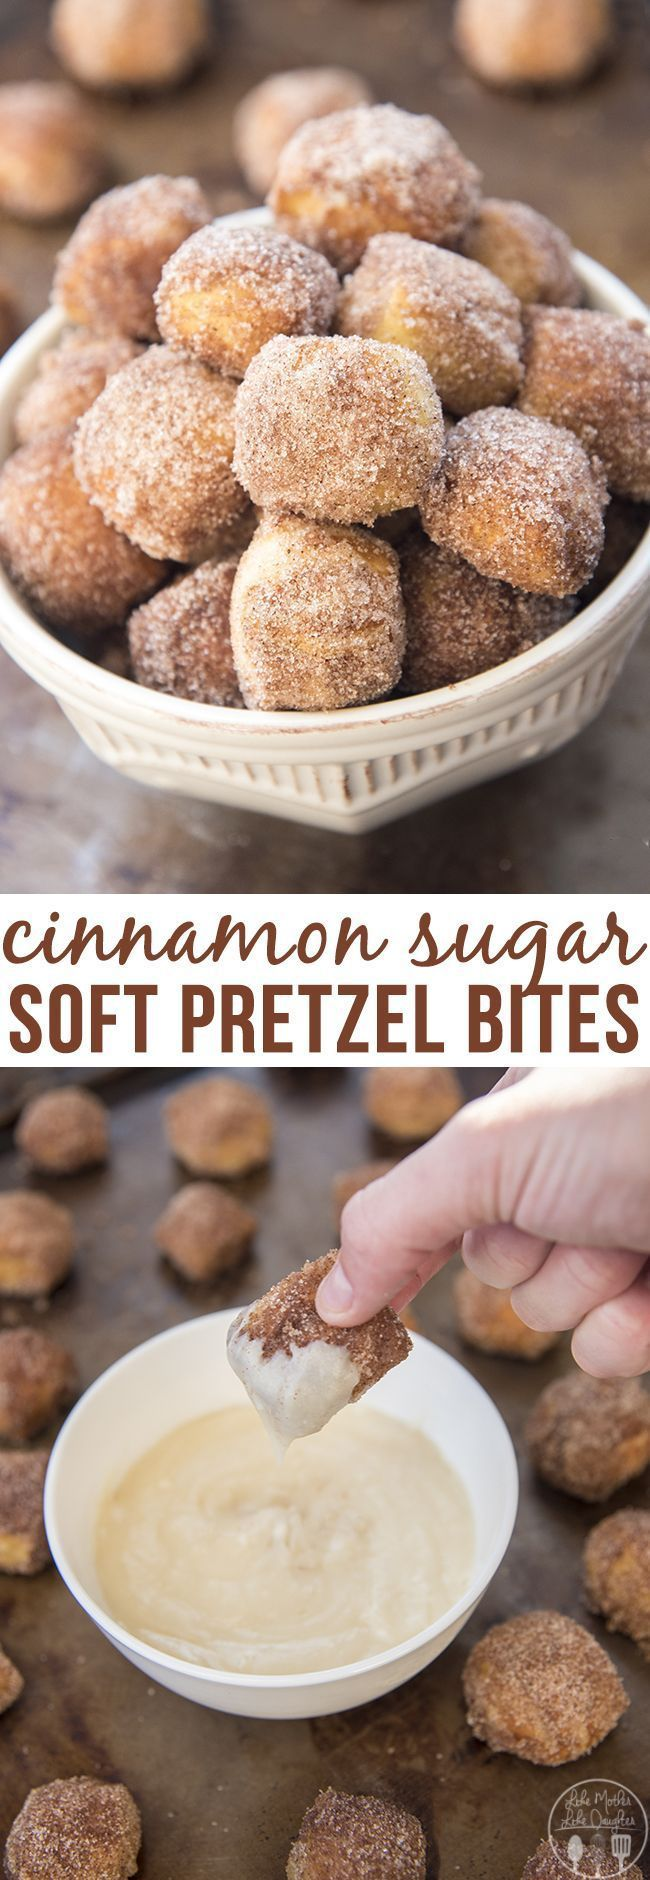 Cinnamon Sugar Soft Pretzel Bites - These cinnamon sugar sbites are perfect soft pretzels with a chewy pretzel crust coated in cinnamon sugar. Perfect served with a warm cream cheese dip!